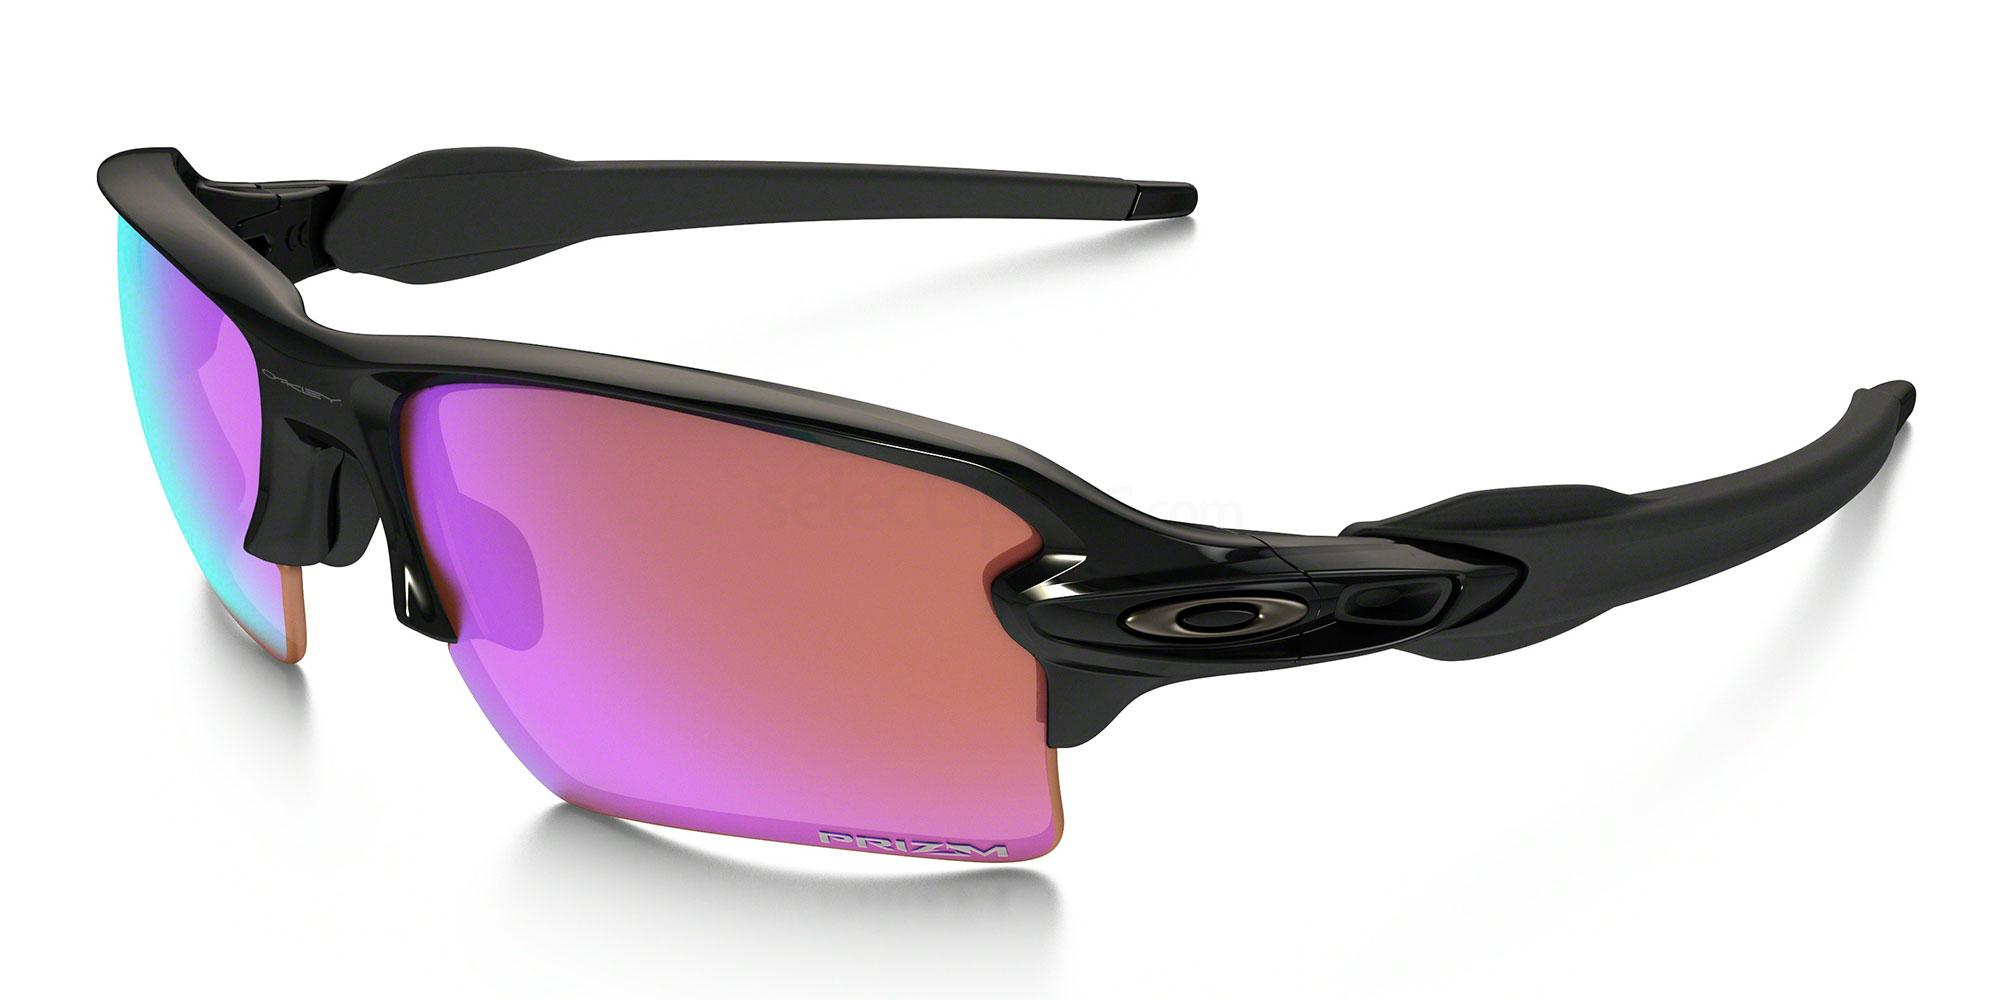 918805 OO9188 PRIZM GOLF FLAK 2.0 XL Sunglasses, Oakley